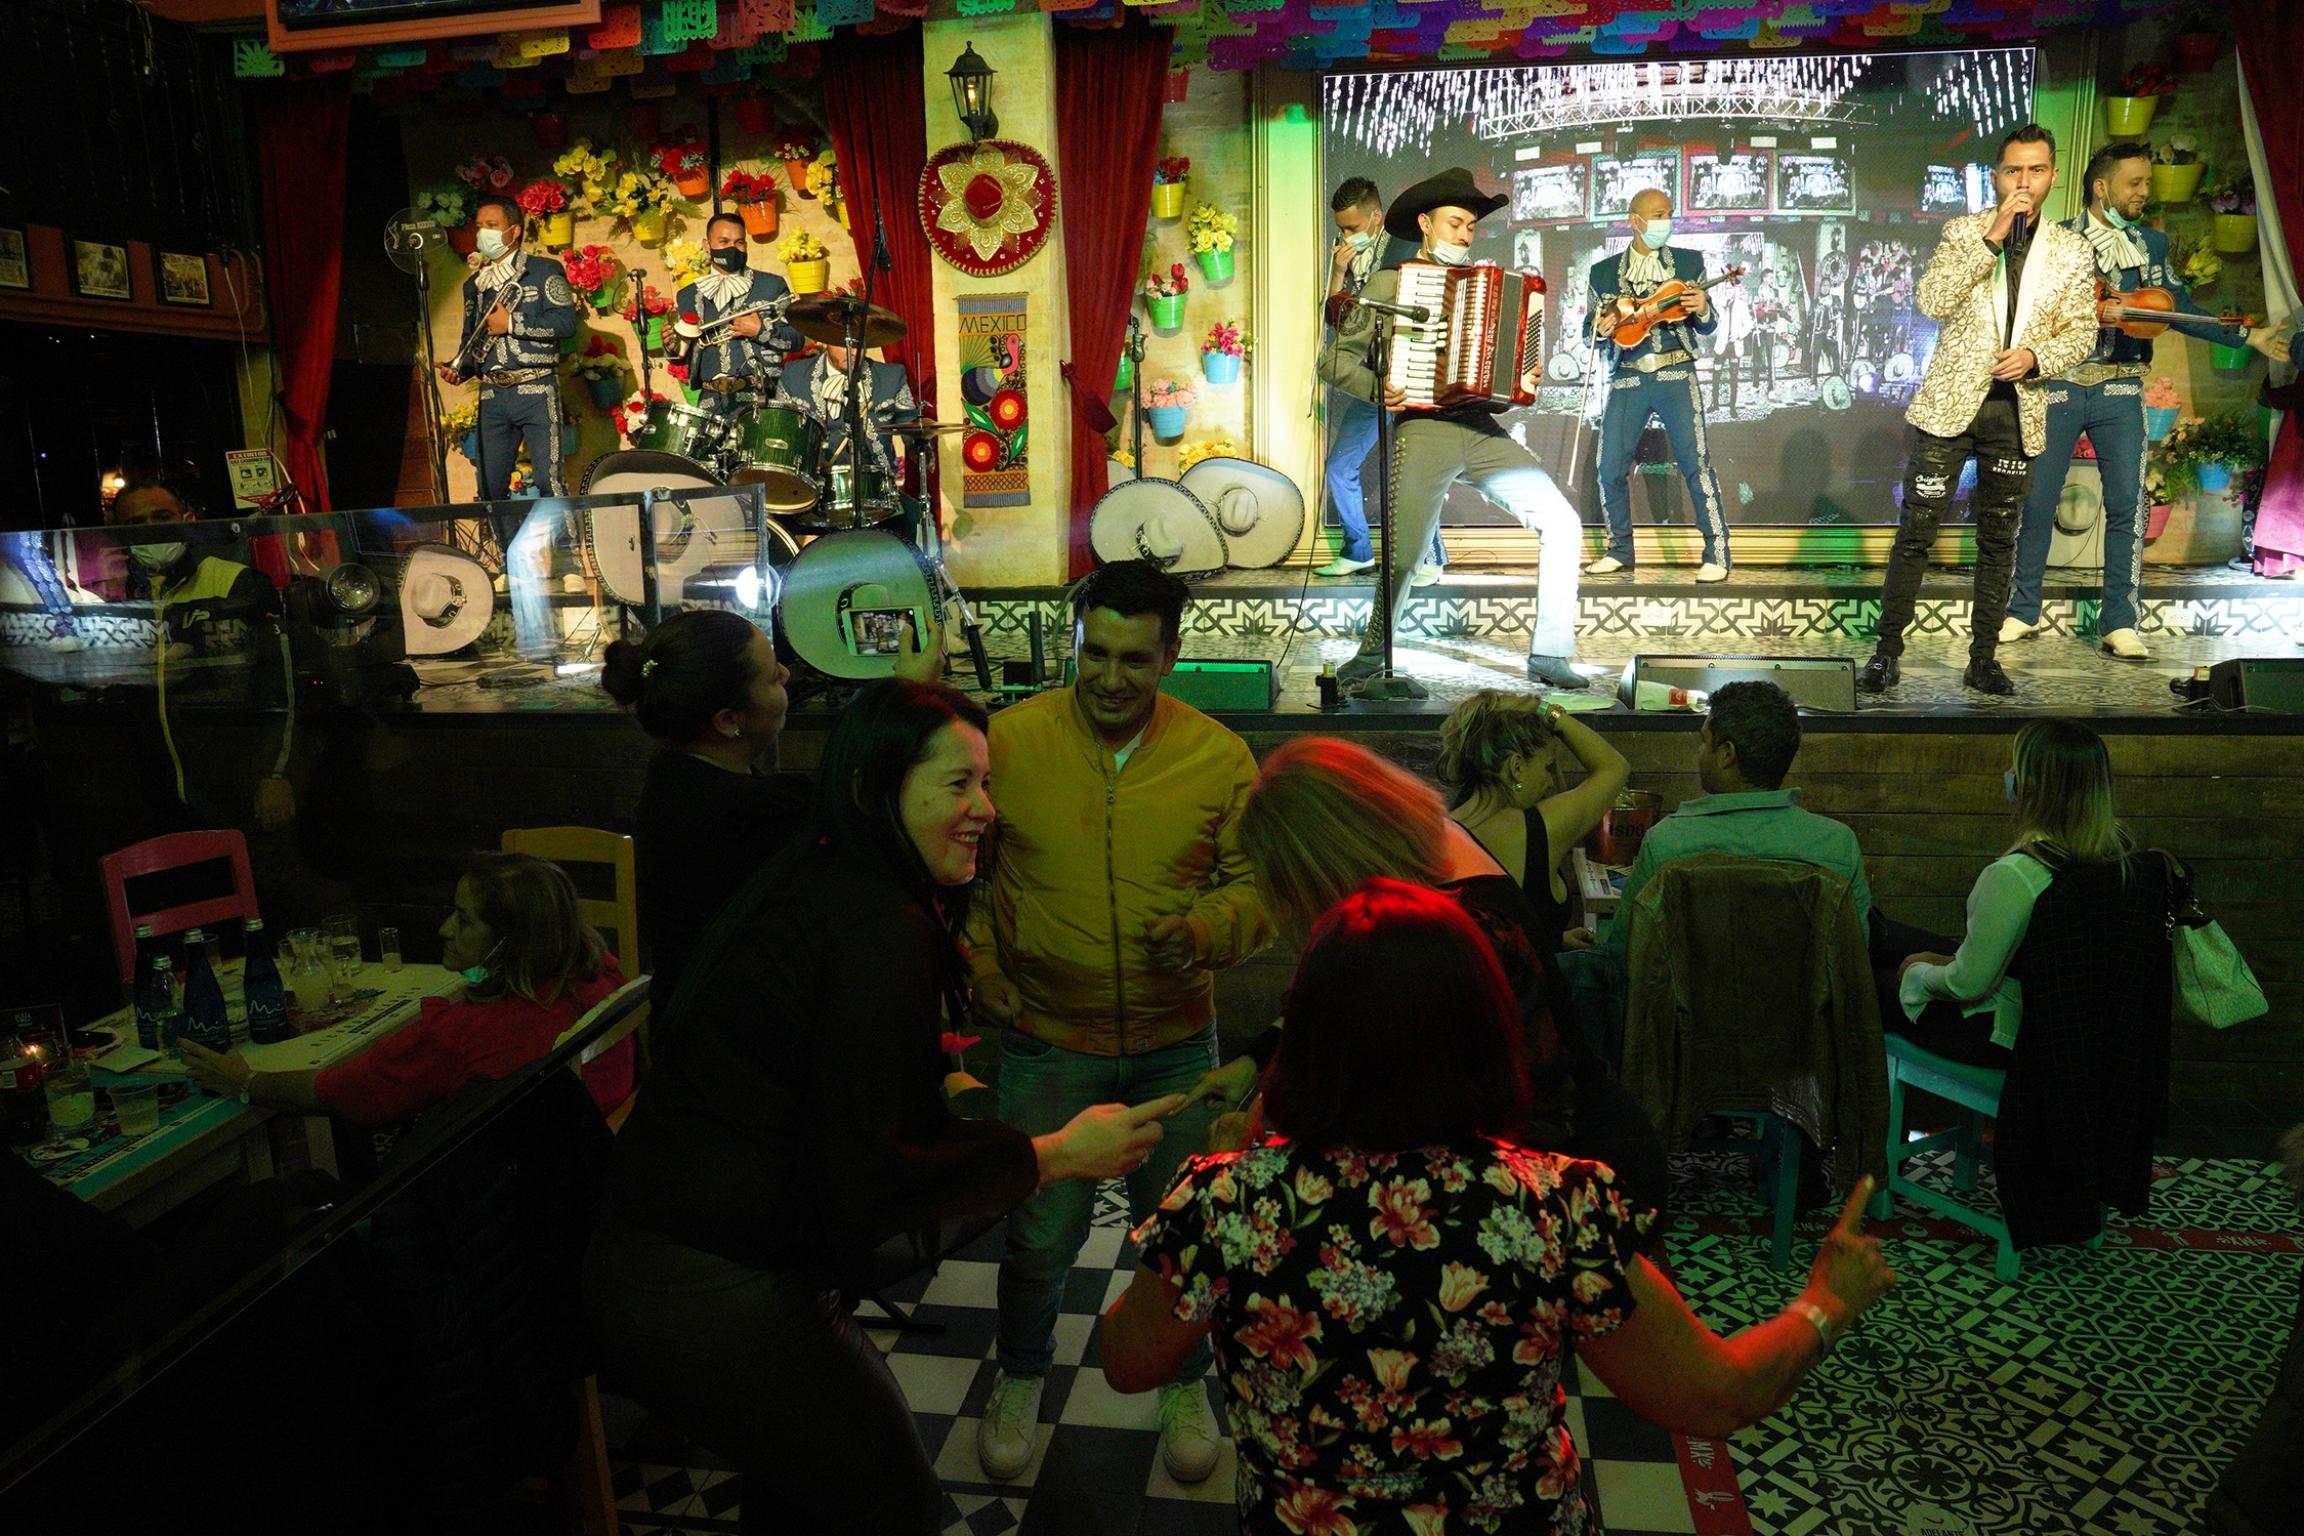 People mingle at thePlaza MX nightclub in Bogotá, Colombia